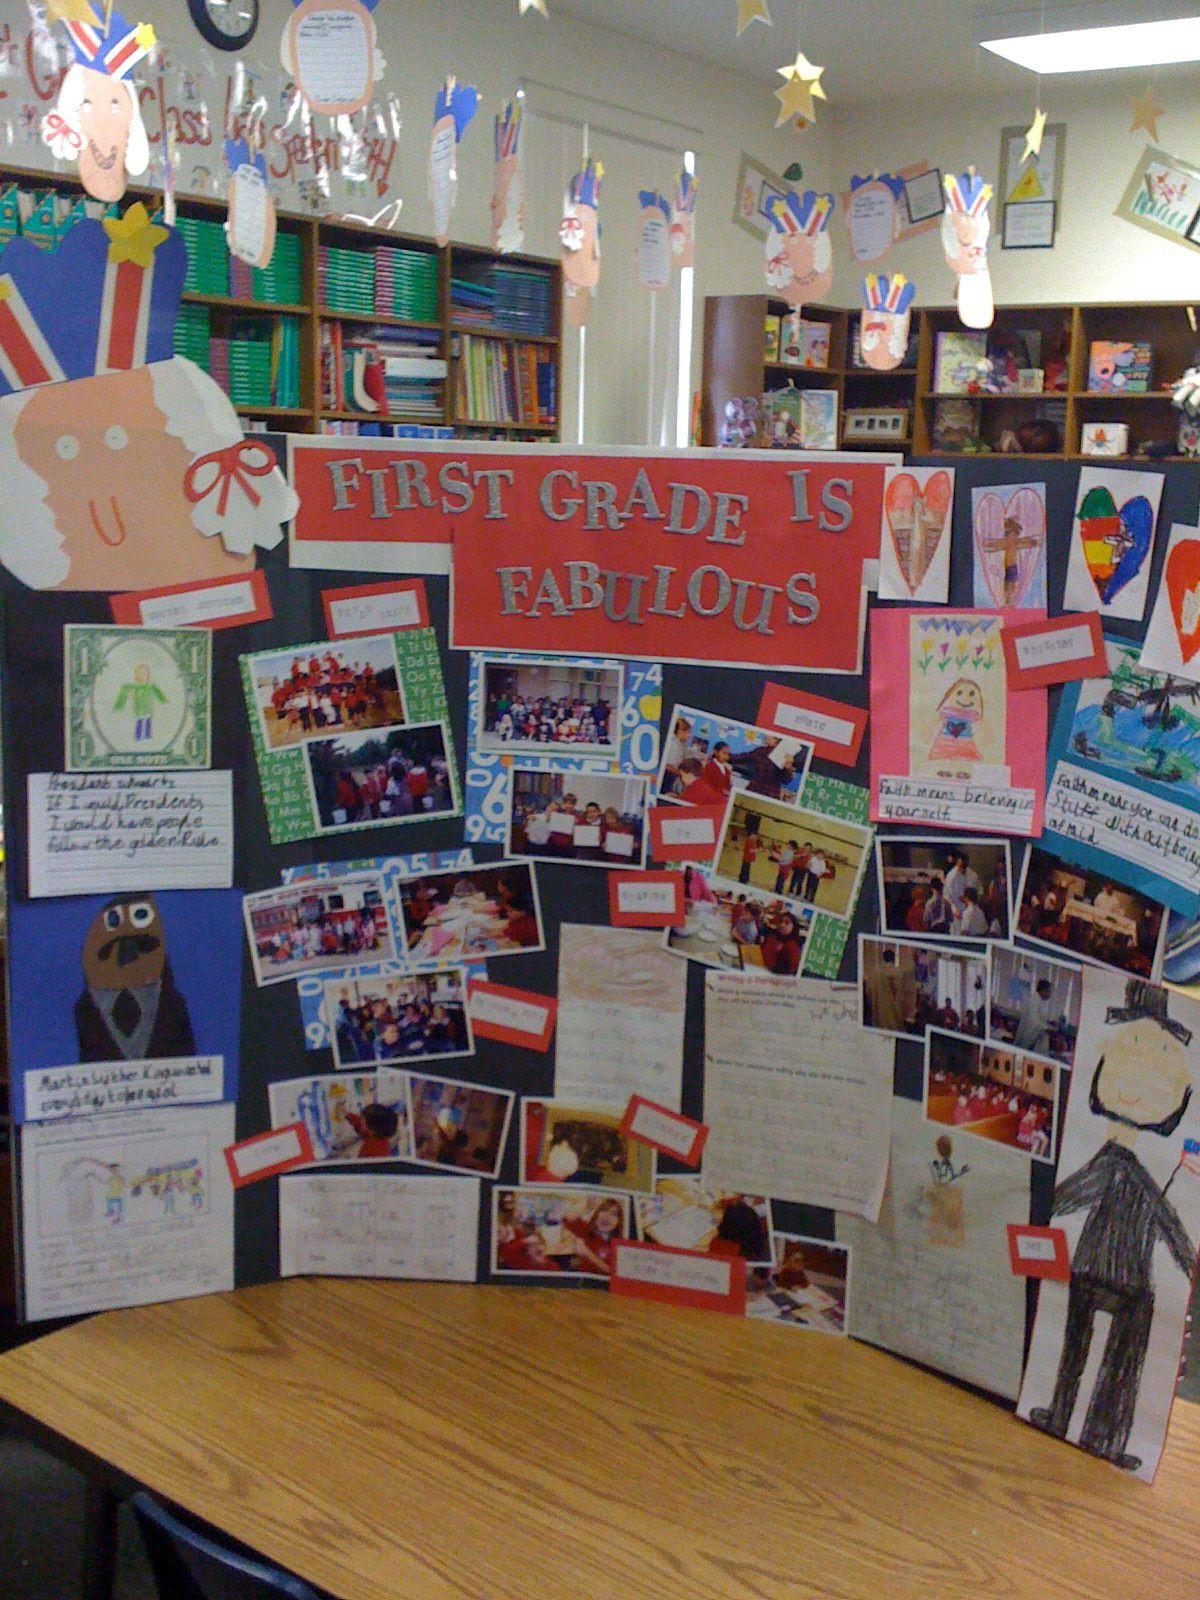 Classroom Presentation Ideas ~ A first grade presentation board i put together for our